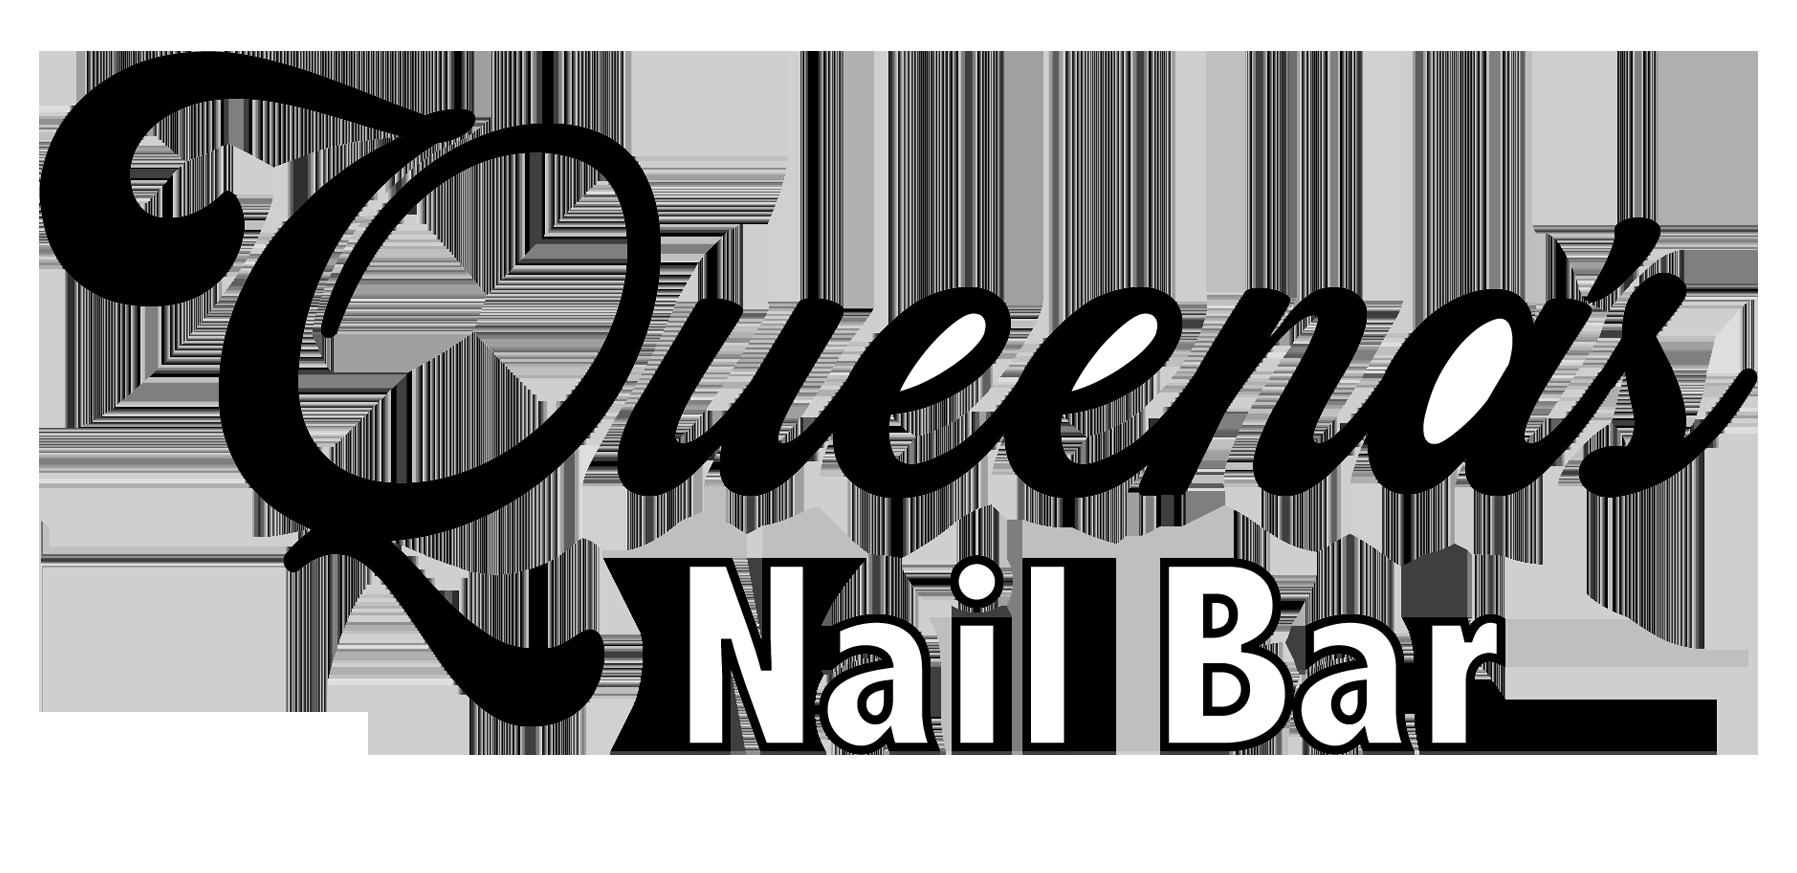 Nail salon 85253 | Queena 's Nail Bar  | Scottsdale, AZ 85253